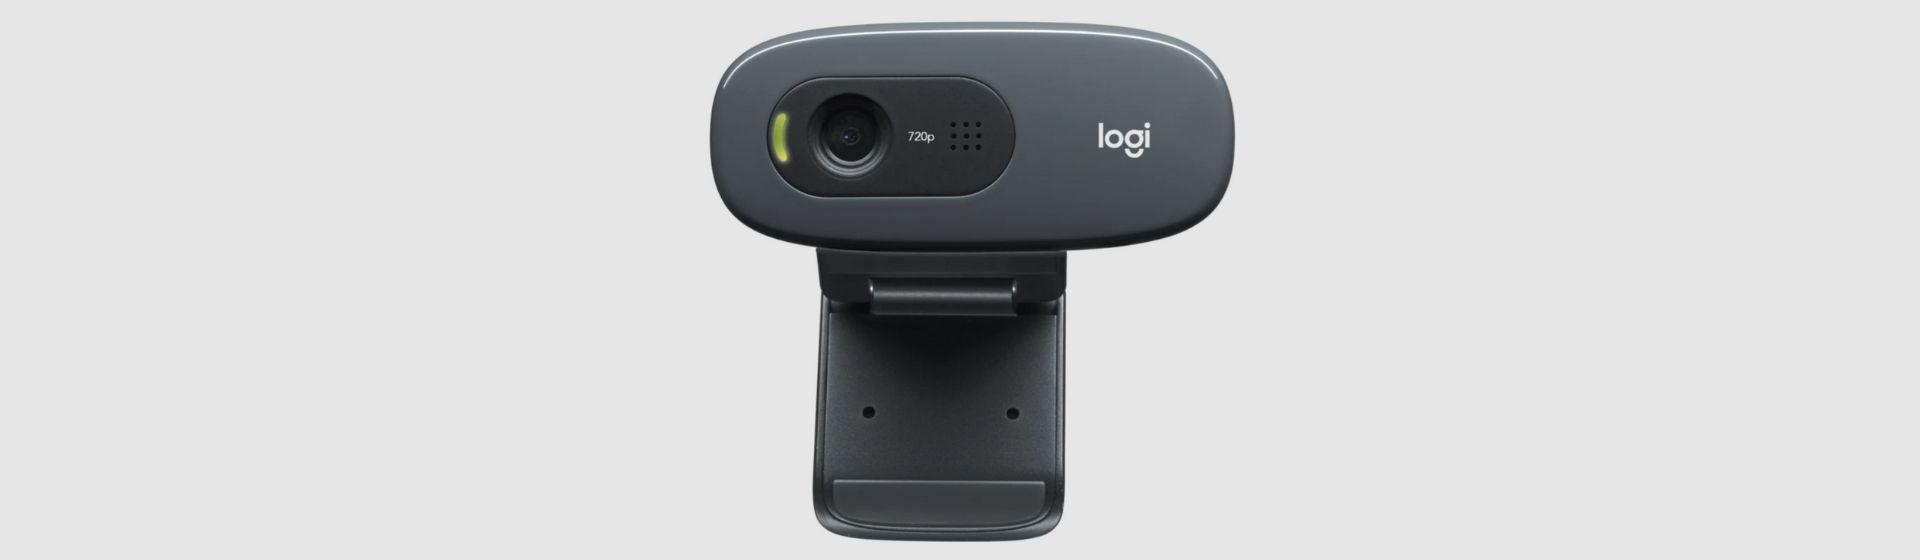 Webcam Logitech C270 HD é boa para home office? Veja análise